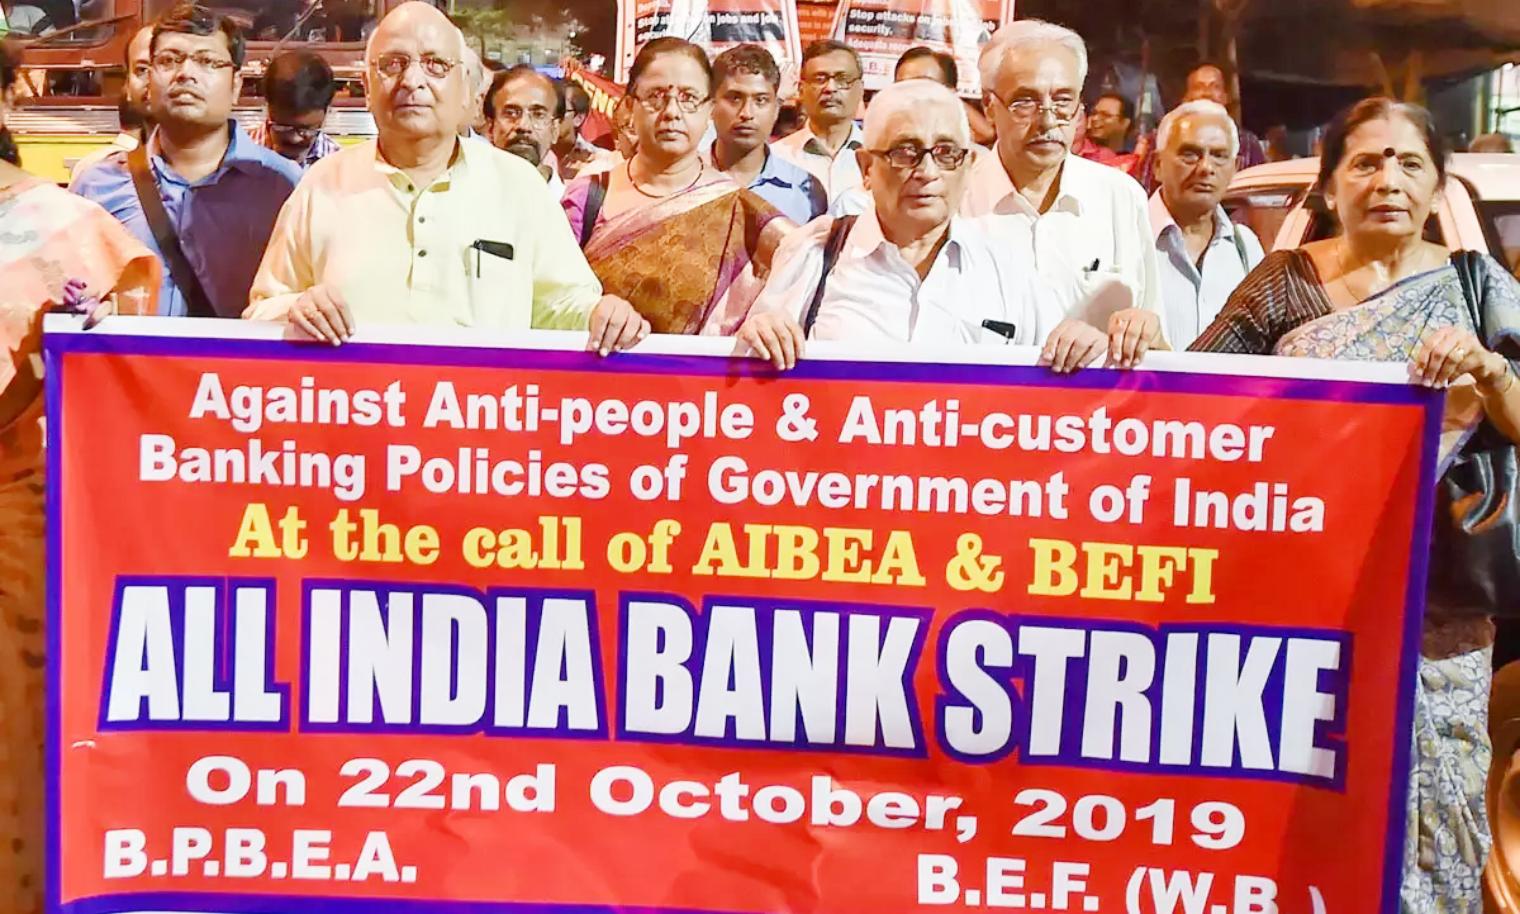 "Se extiende la crisis bancaria en India - Muertes, huelga, negación de la Corte Suprema ""ancho ="" 1520 ""altura ="" 914 ""srcset ="" https://blackswanfinances.com/wp-content/uploads/2019/10/strike1.png 1520w, https://news.bitcoin.com/wp-content/uploads/2019/10/strike1 -300x180.png 300w, https://news.bitcoin.com/wp-content/uploads/2019/10/strike1-768x462.png 768w, https://news.bitcoin.com/wp-content/uploads/2019 /10/strike1-1024x616.png 1024w, https://news.bitcoin.com/wp-content/uploads/2019/10/strike1-696x419.png 696w, https://news.bitcoin.com/wp-content /uploads/2019/10/strike1-1392x837.png 1392w, https://news.bitcoin.com/wp-content/uploads/2019/10/strike1-1068x642.png 1068w, https://news.bitcoin.com /wp-content/uploads/2019/10/strike1-698x420.png 698w ""tamaños ="" (ancho máximo: 1520px) 100vw, 1520px"